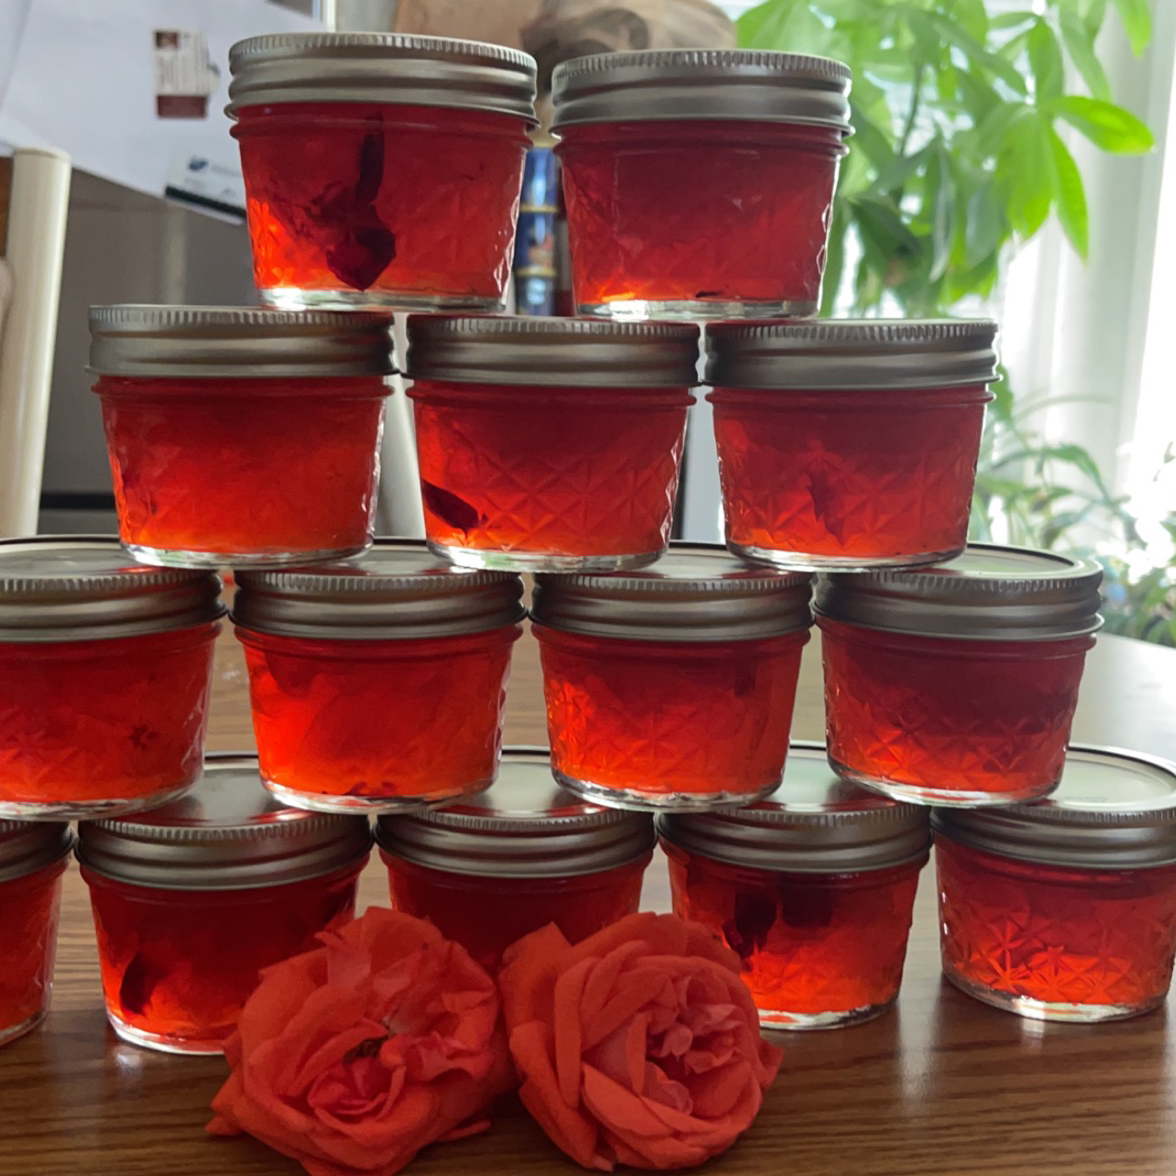 Rose Petal Jam dwan